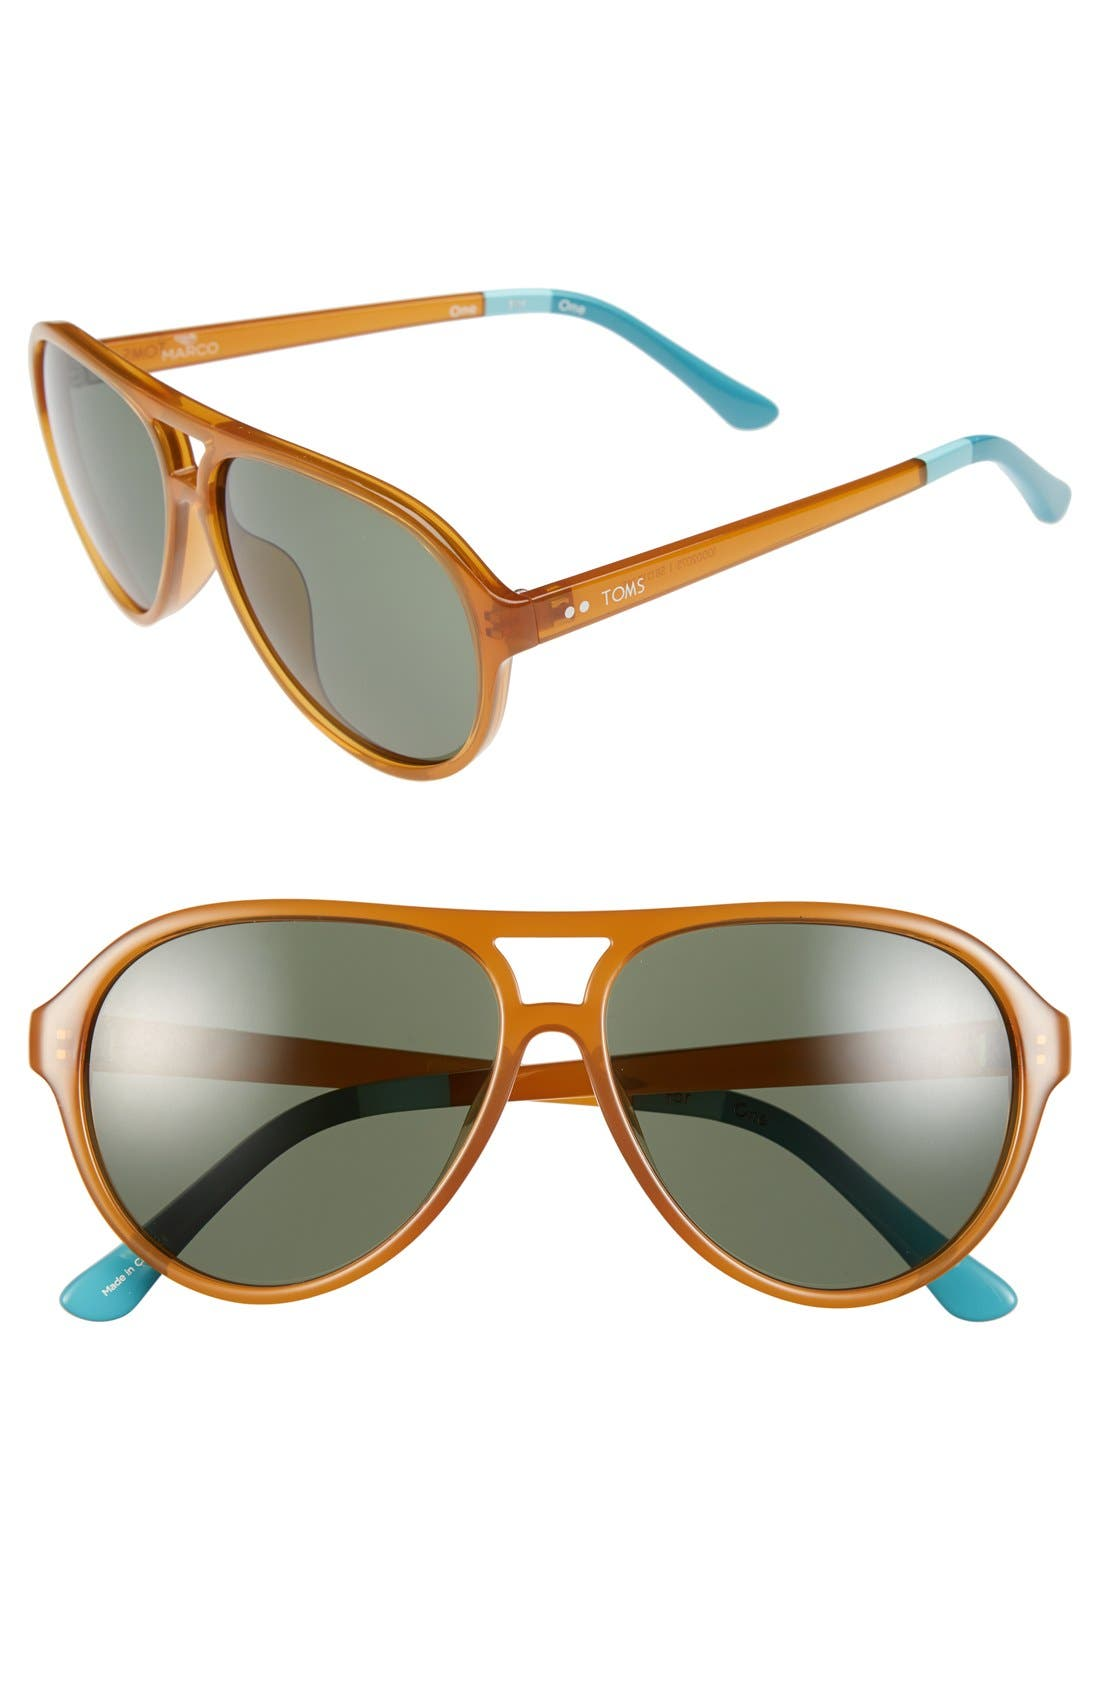 TOMS,                             'Marco' 58mm Aviator Sunglasses,                             Main thumbnail 1, color,                             220